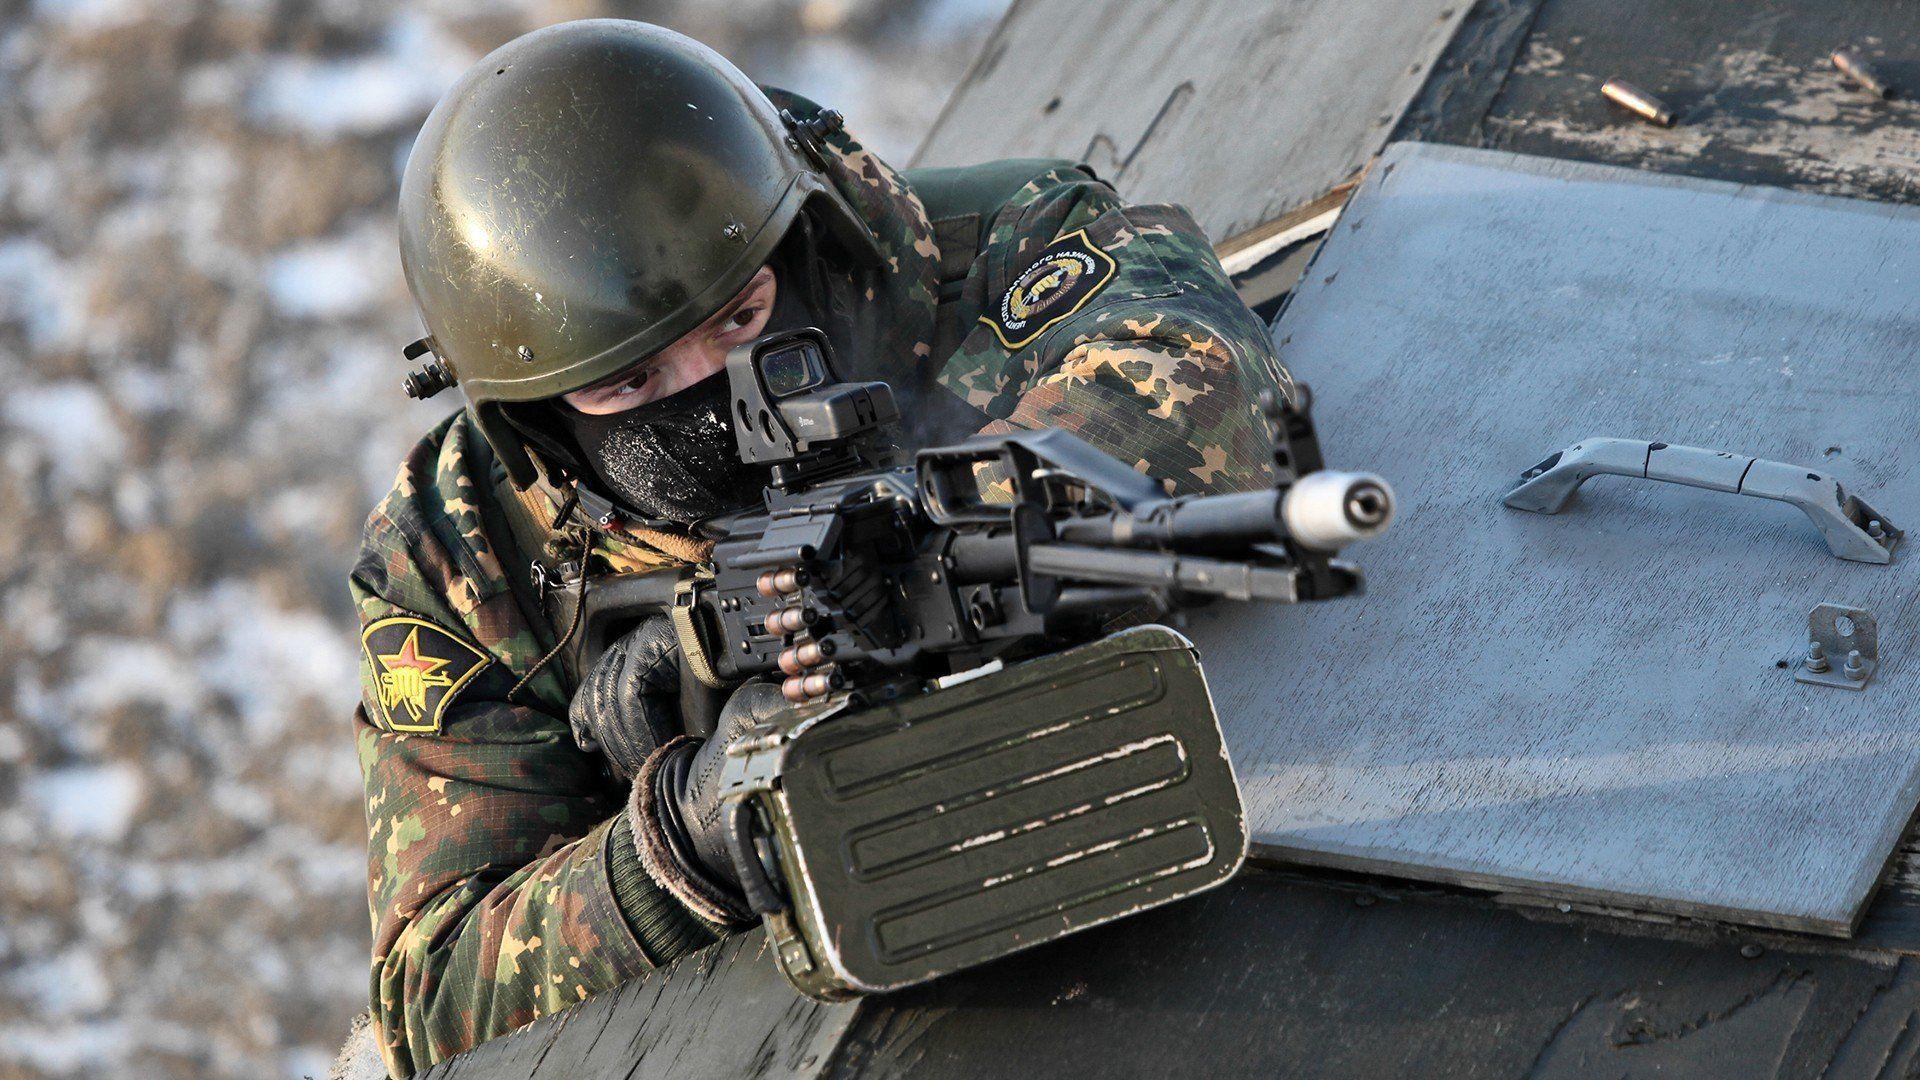 PKP Pechenegmachine GunsgunsweaponsSpetsnazRussian Armysoldiers Wallpaper